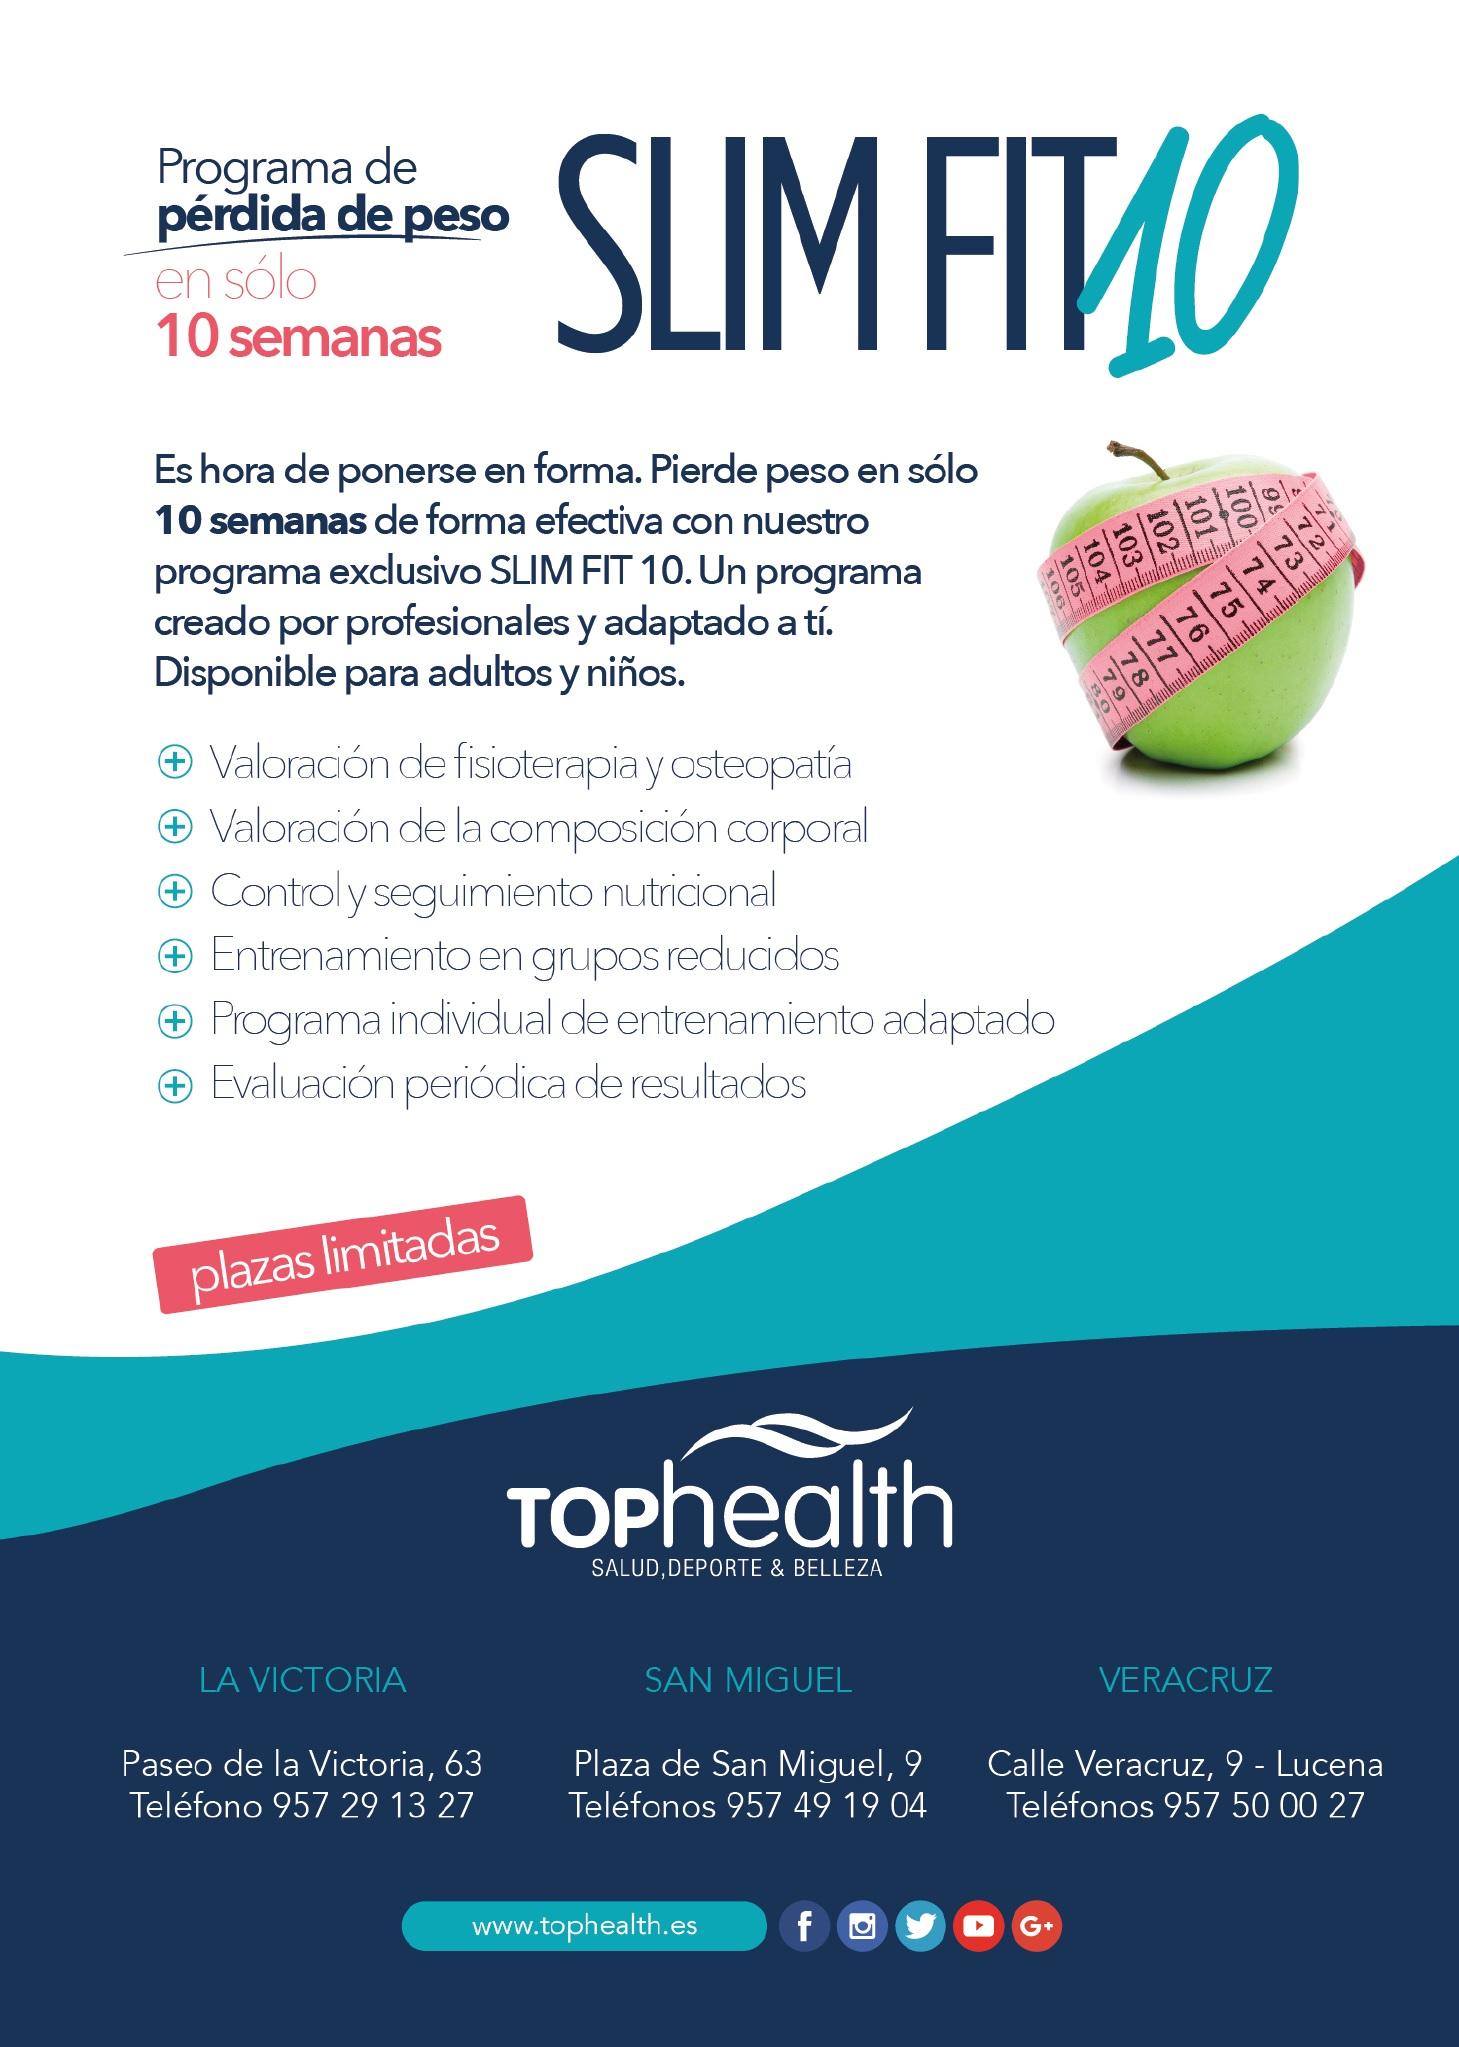 slim fit 10 top health gimnasio en cordoba